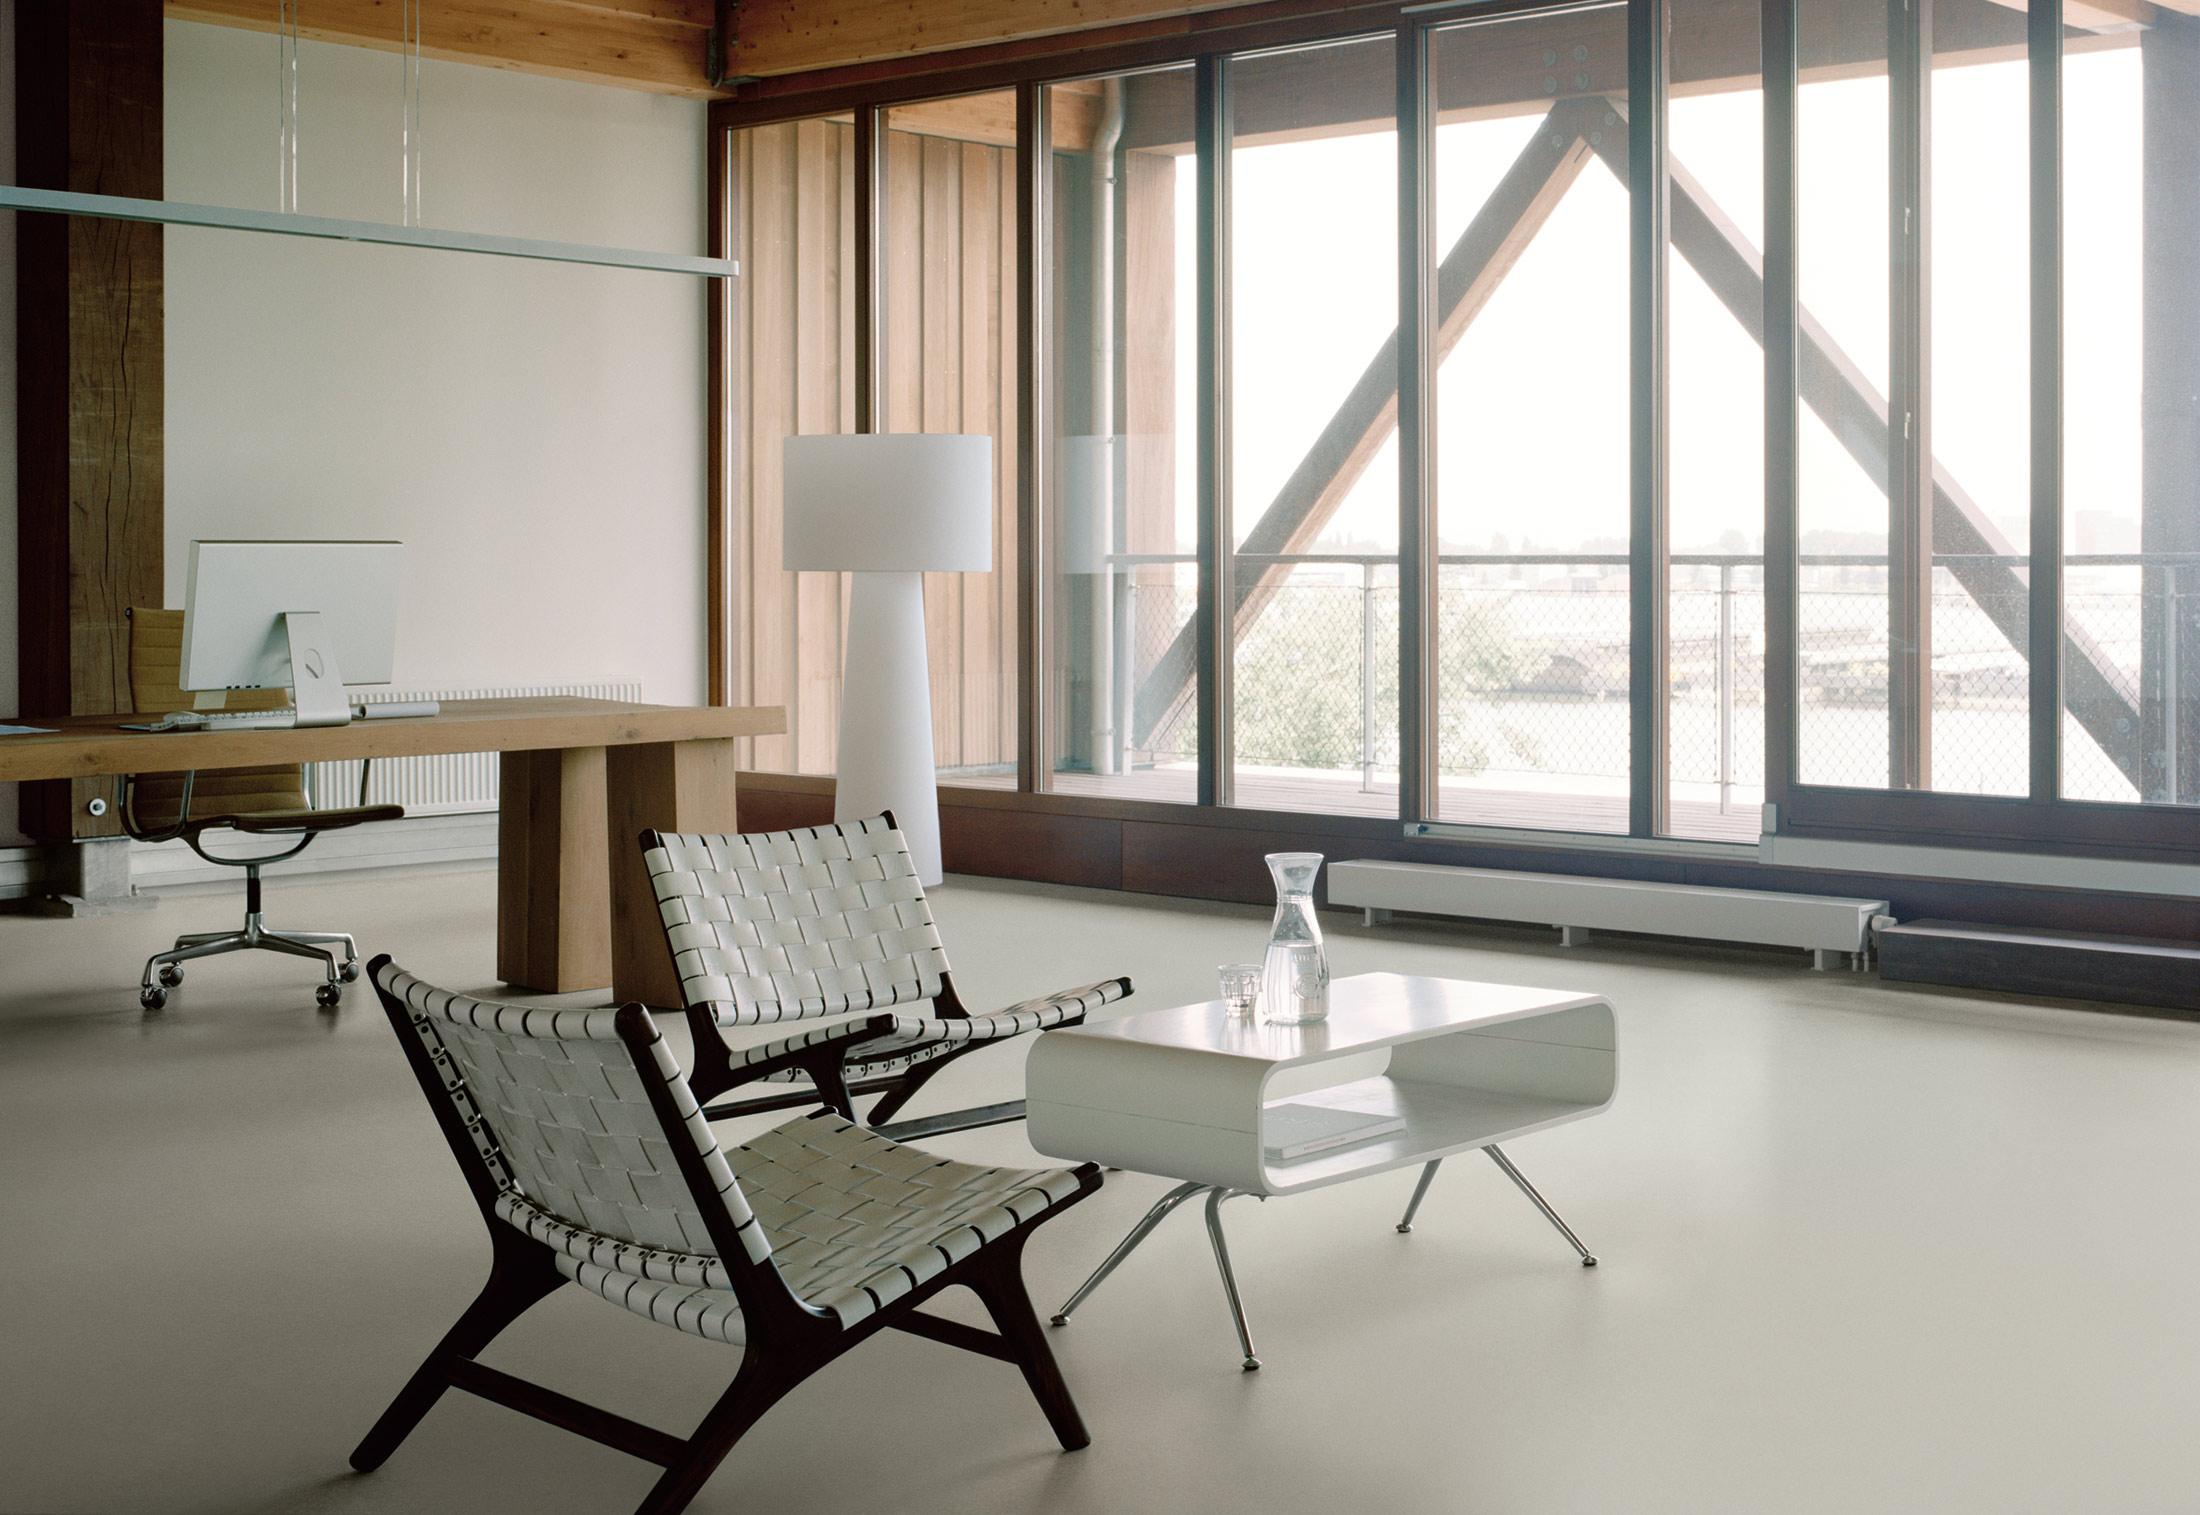 walton uni von forbo stylepark. Black Bedroom Furniture Sets. Home Design Ideas